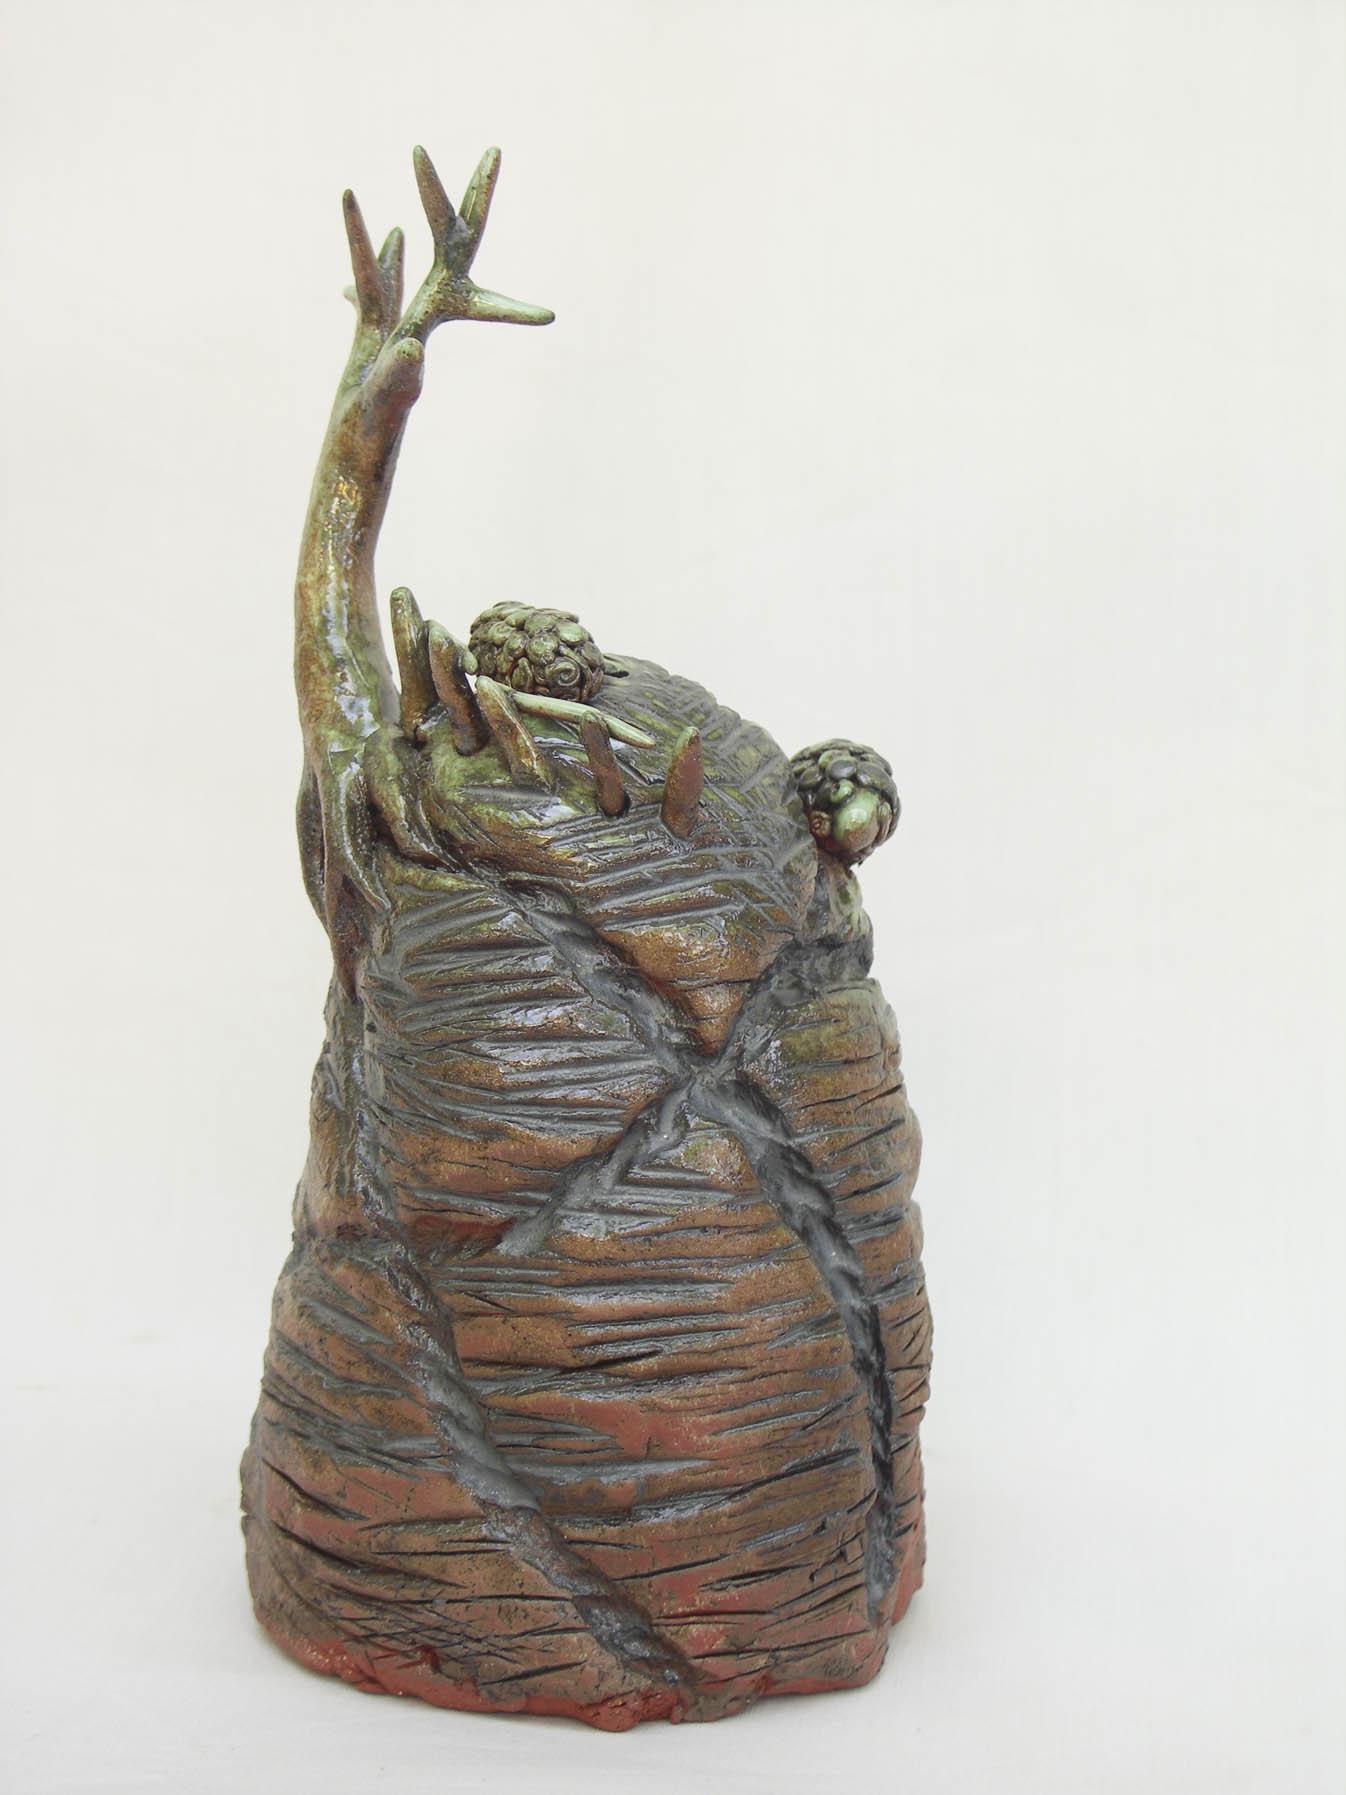 troyan-museum-ralica-yovkova-11